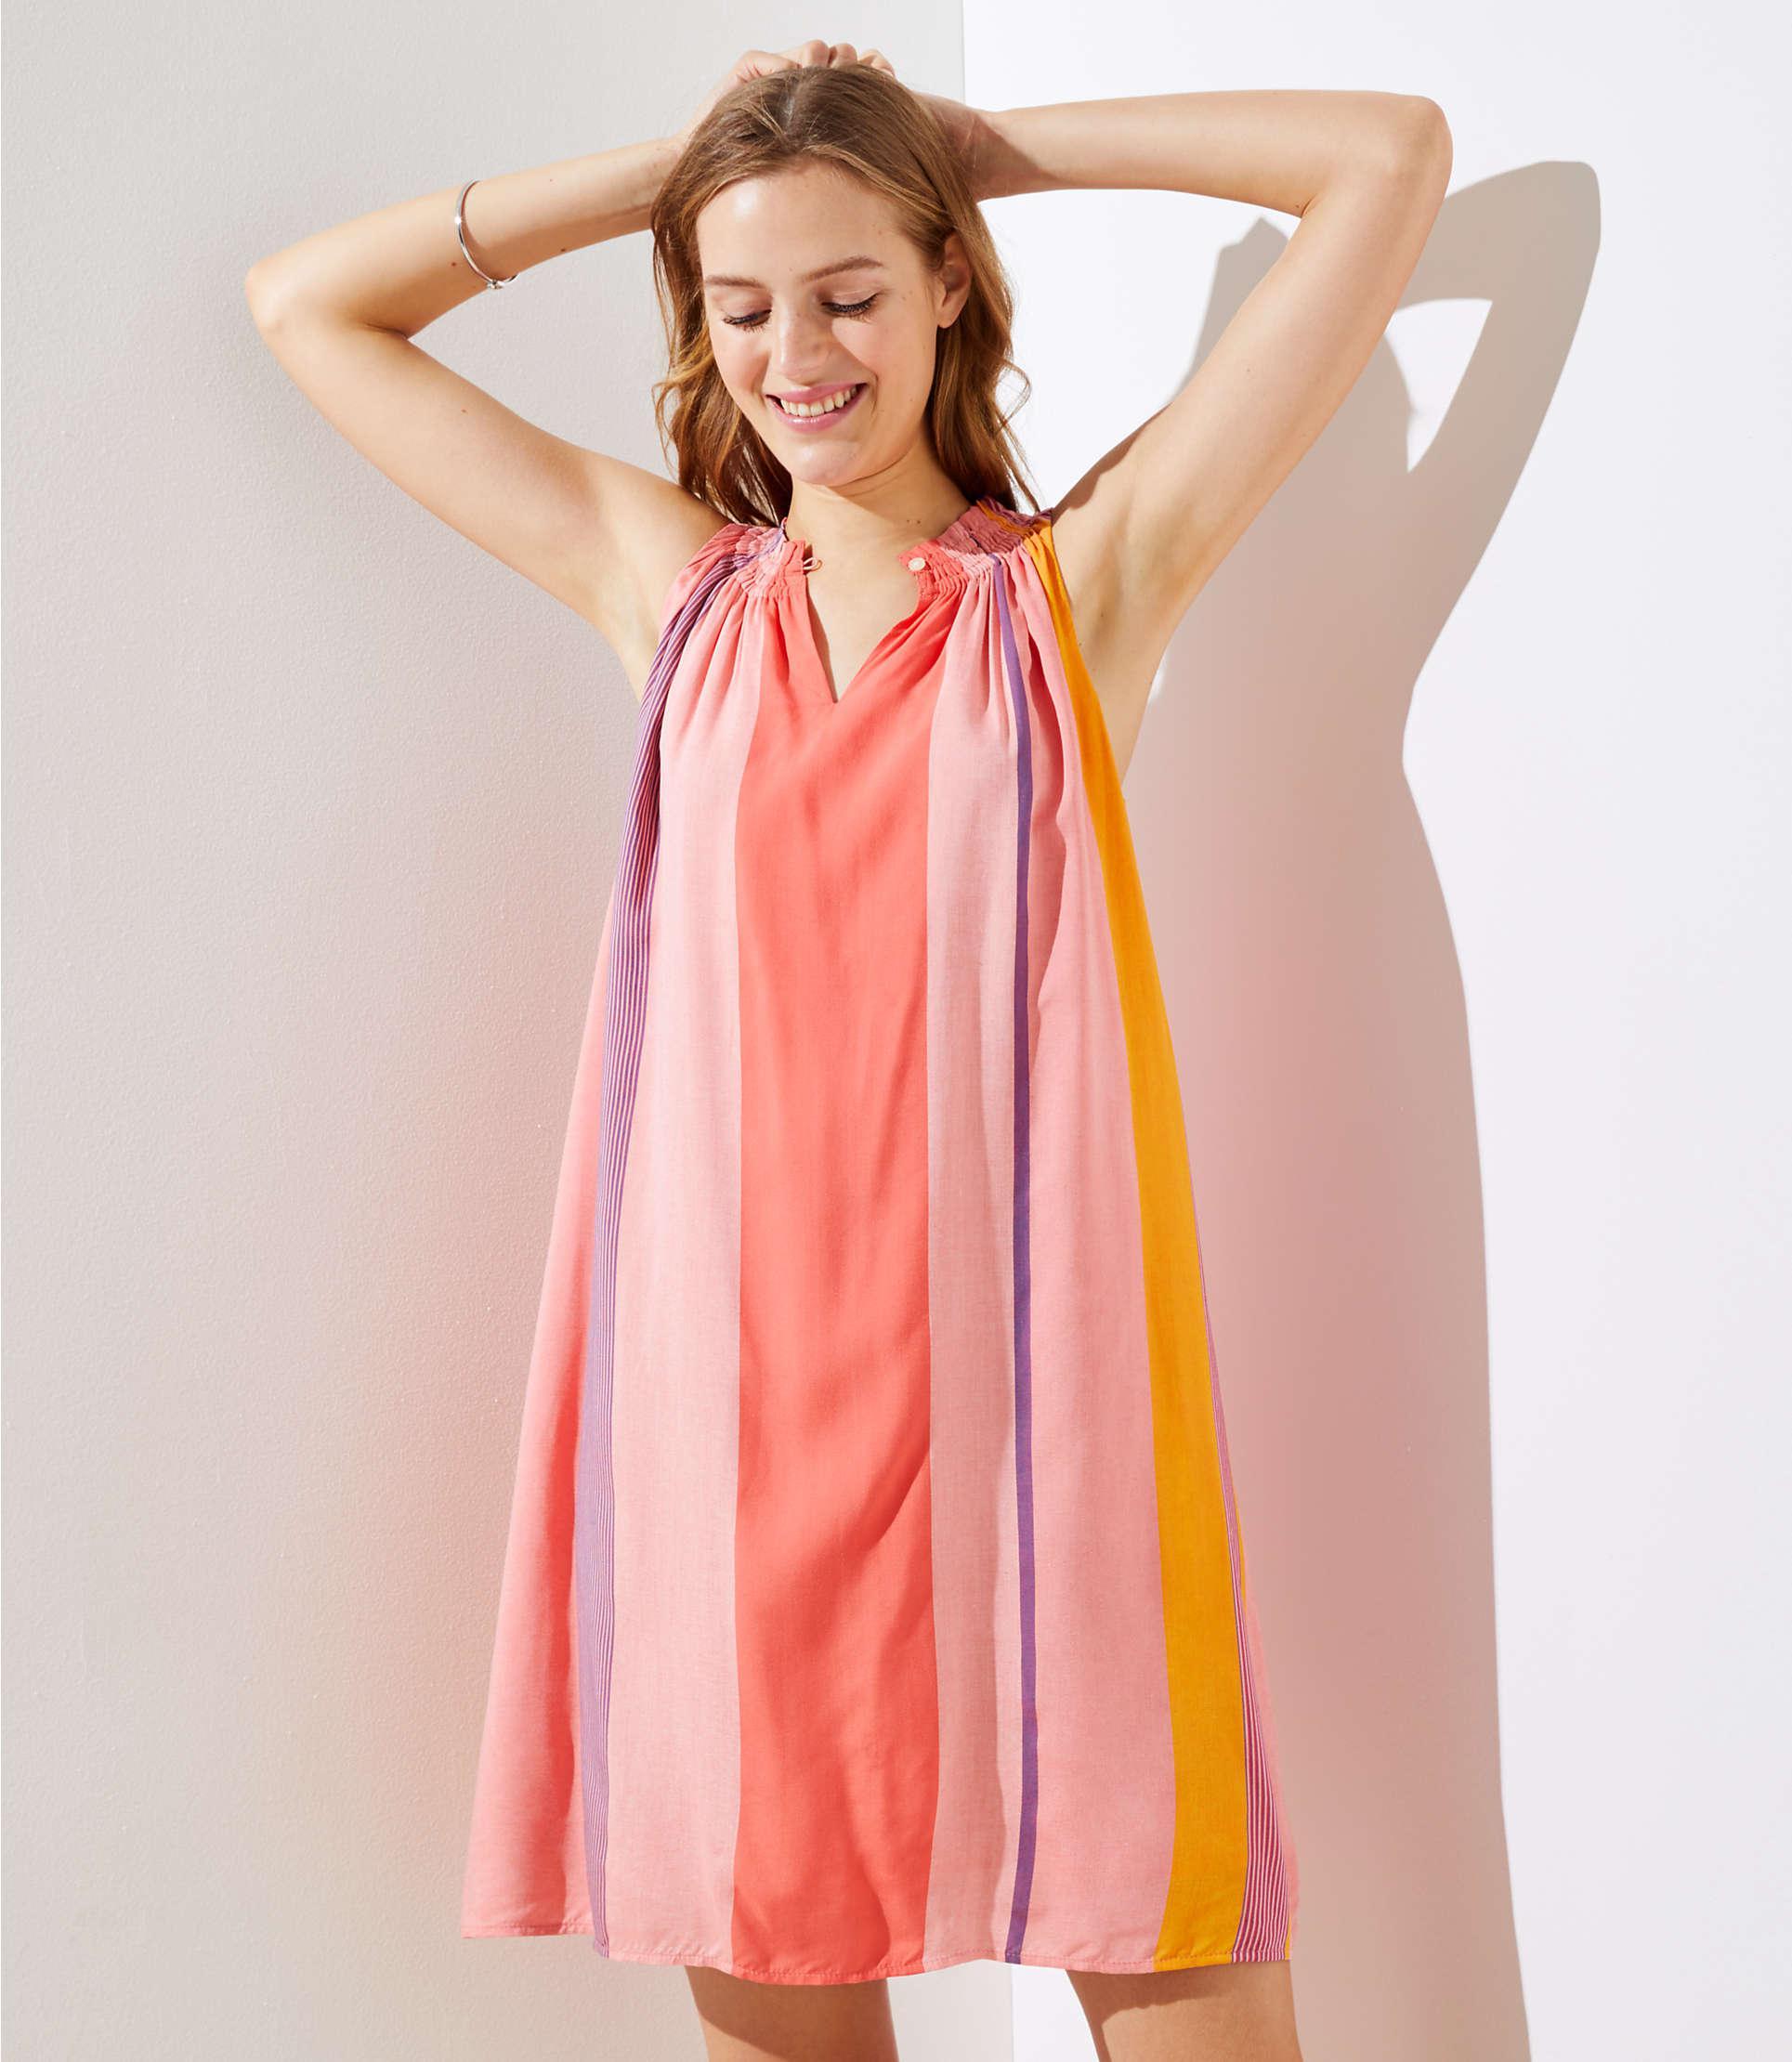 b6fabdb96844 LOFT Tall Watercolor Stripe Halter Swing Dress in Pink - Lyst